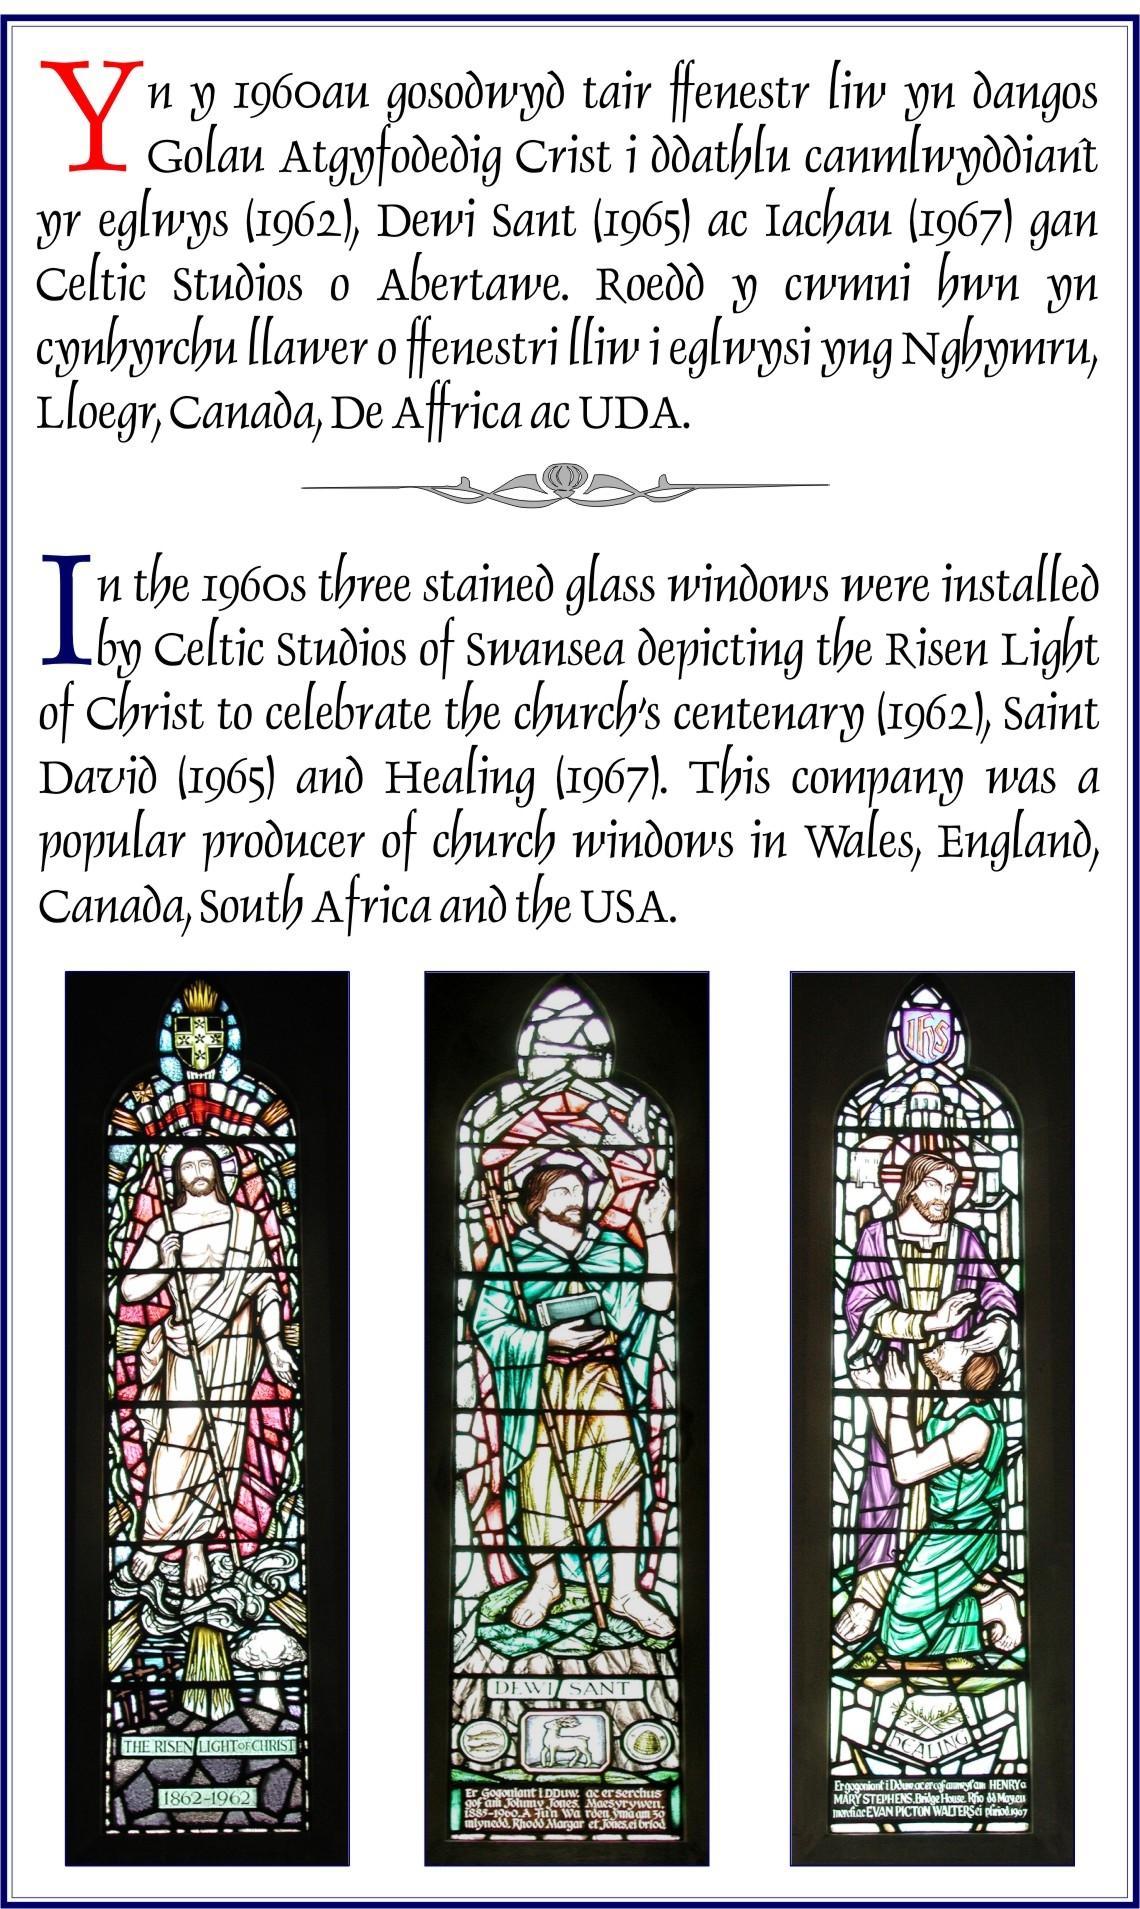 The Risen Light of Christ, St David and Healing